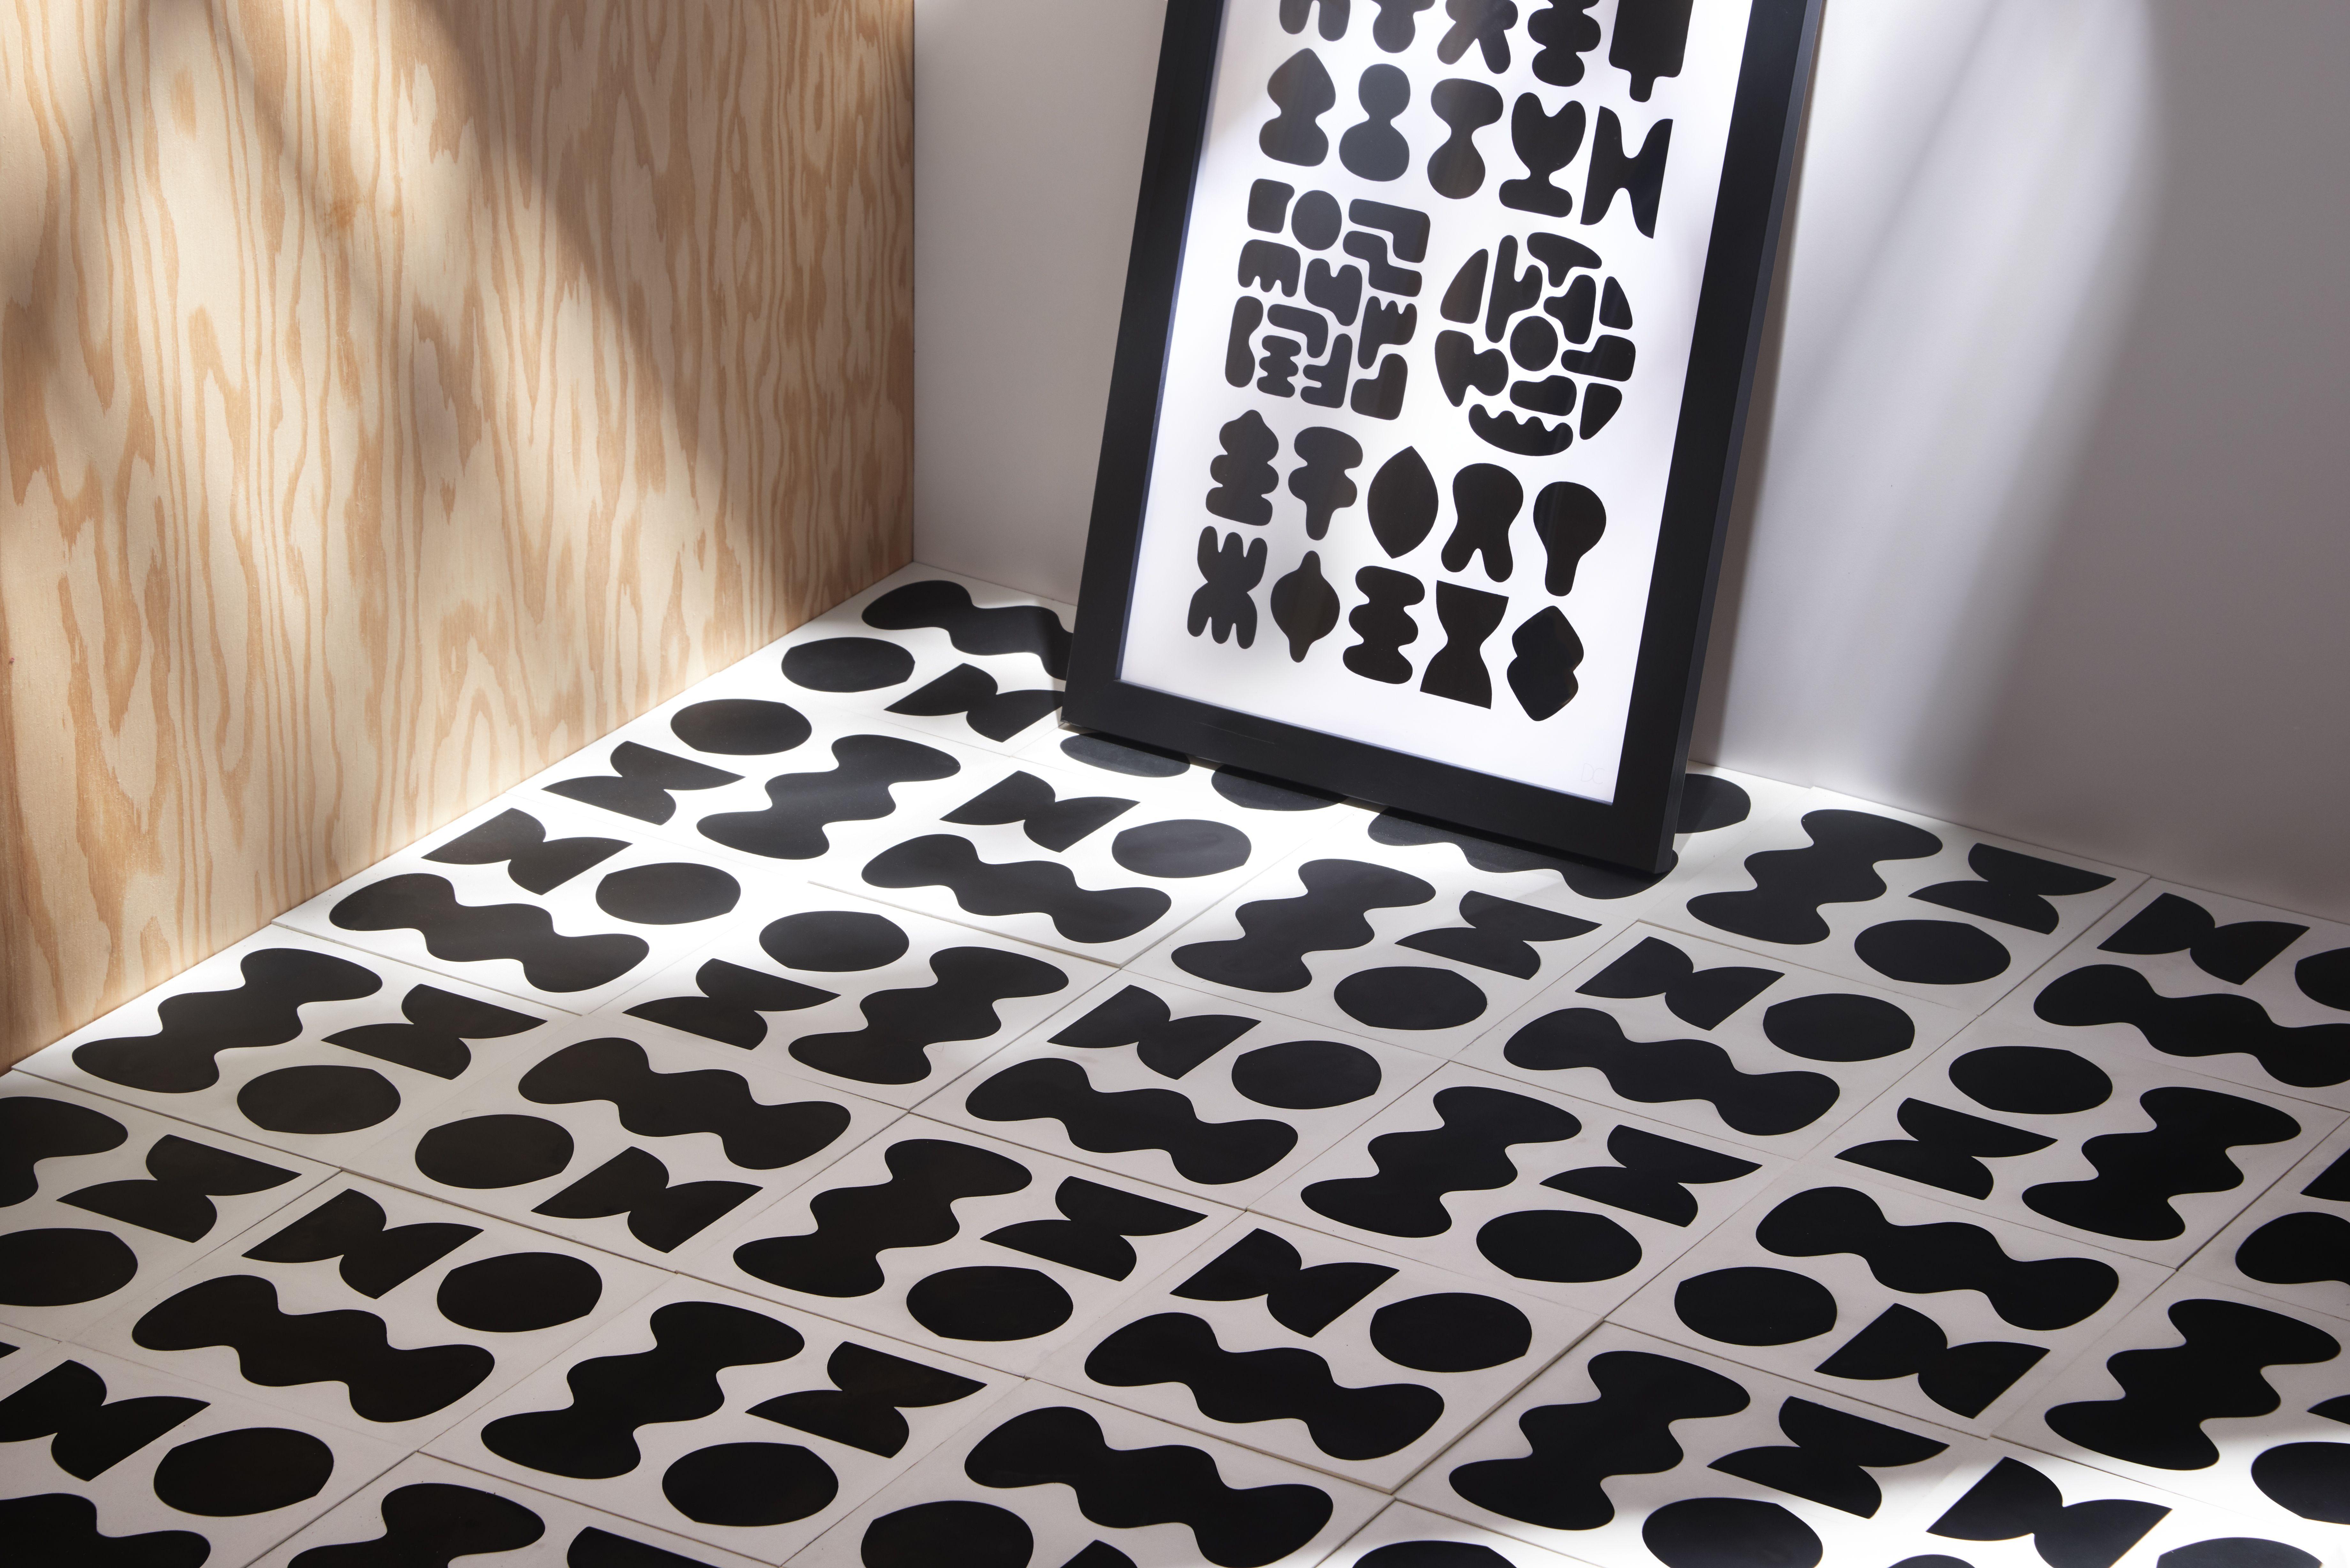 Dan Covert Felt Tile In 2020 Encaustic Tile Design Milk Tile Work